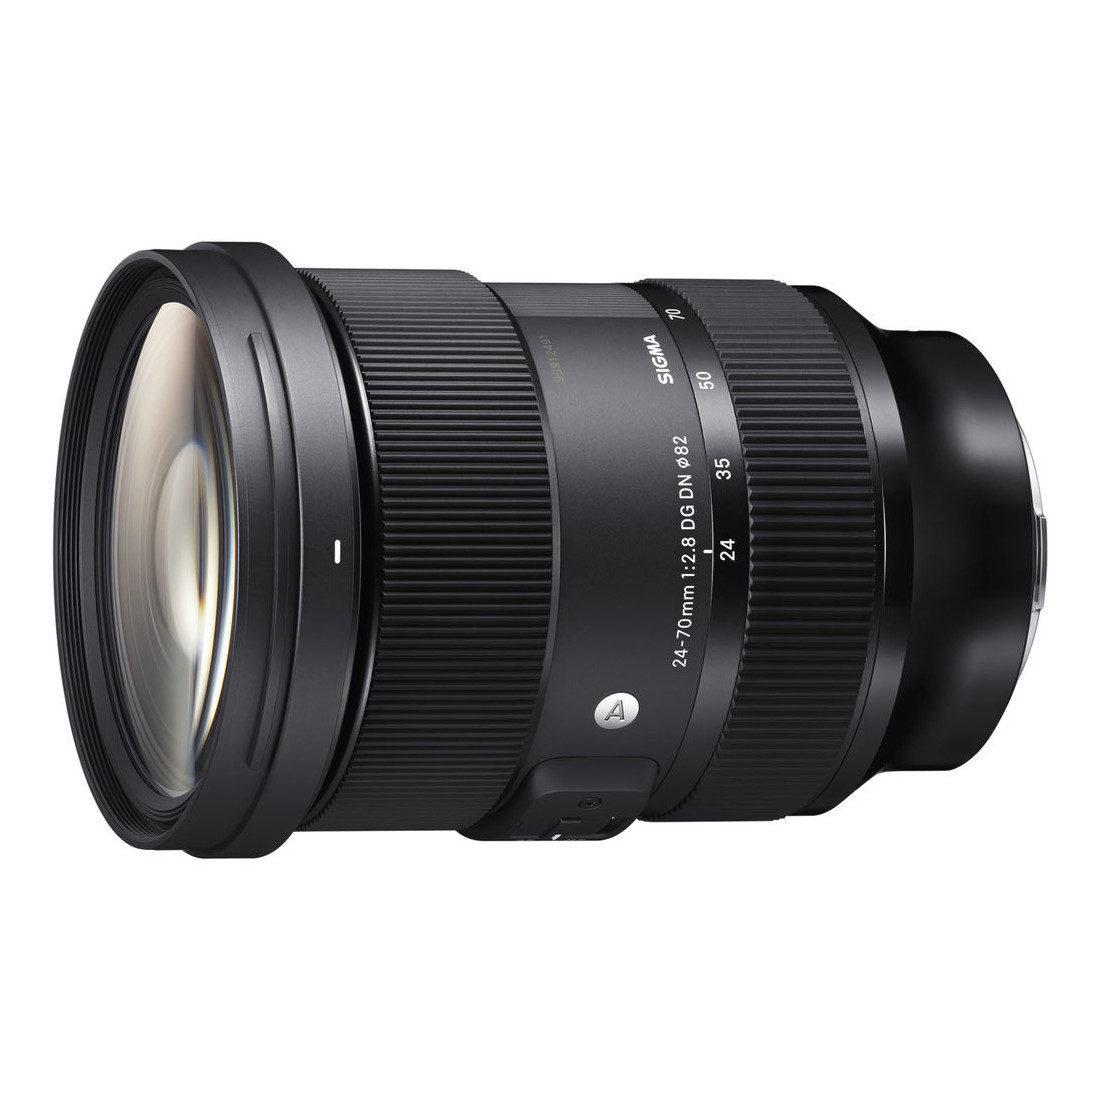 Sigma 24-70mm f/2.8 DG DN Art Objektiv für Sony E Mount